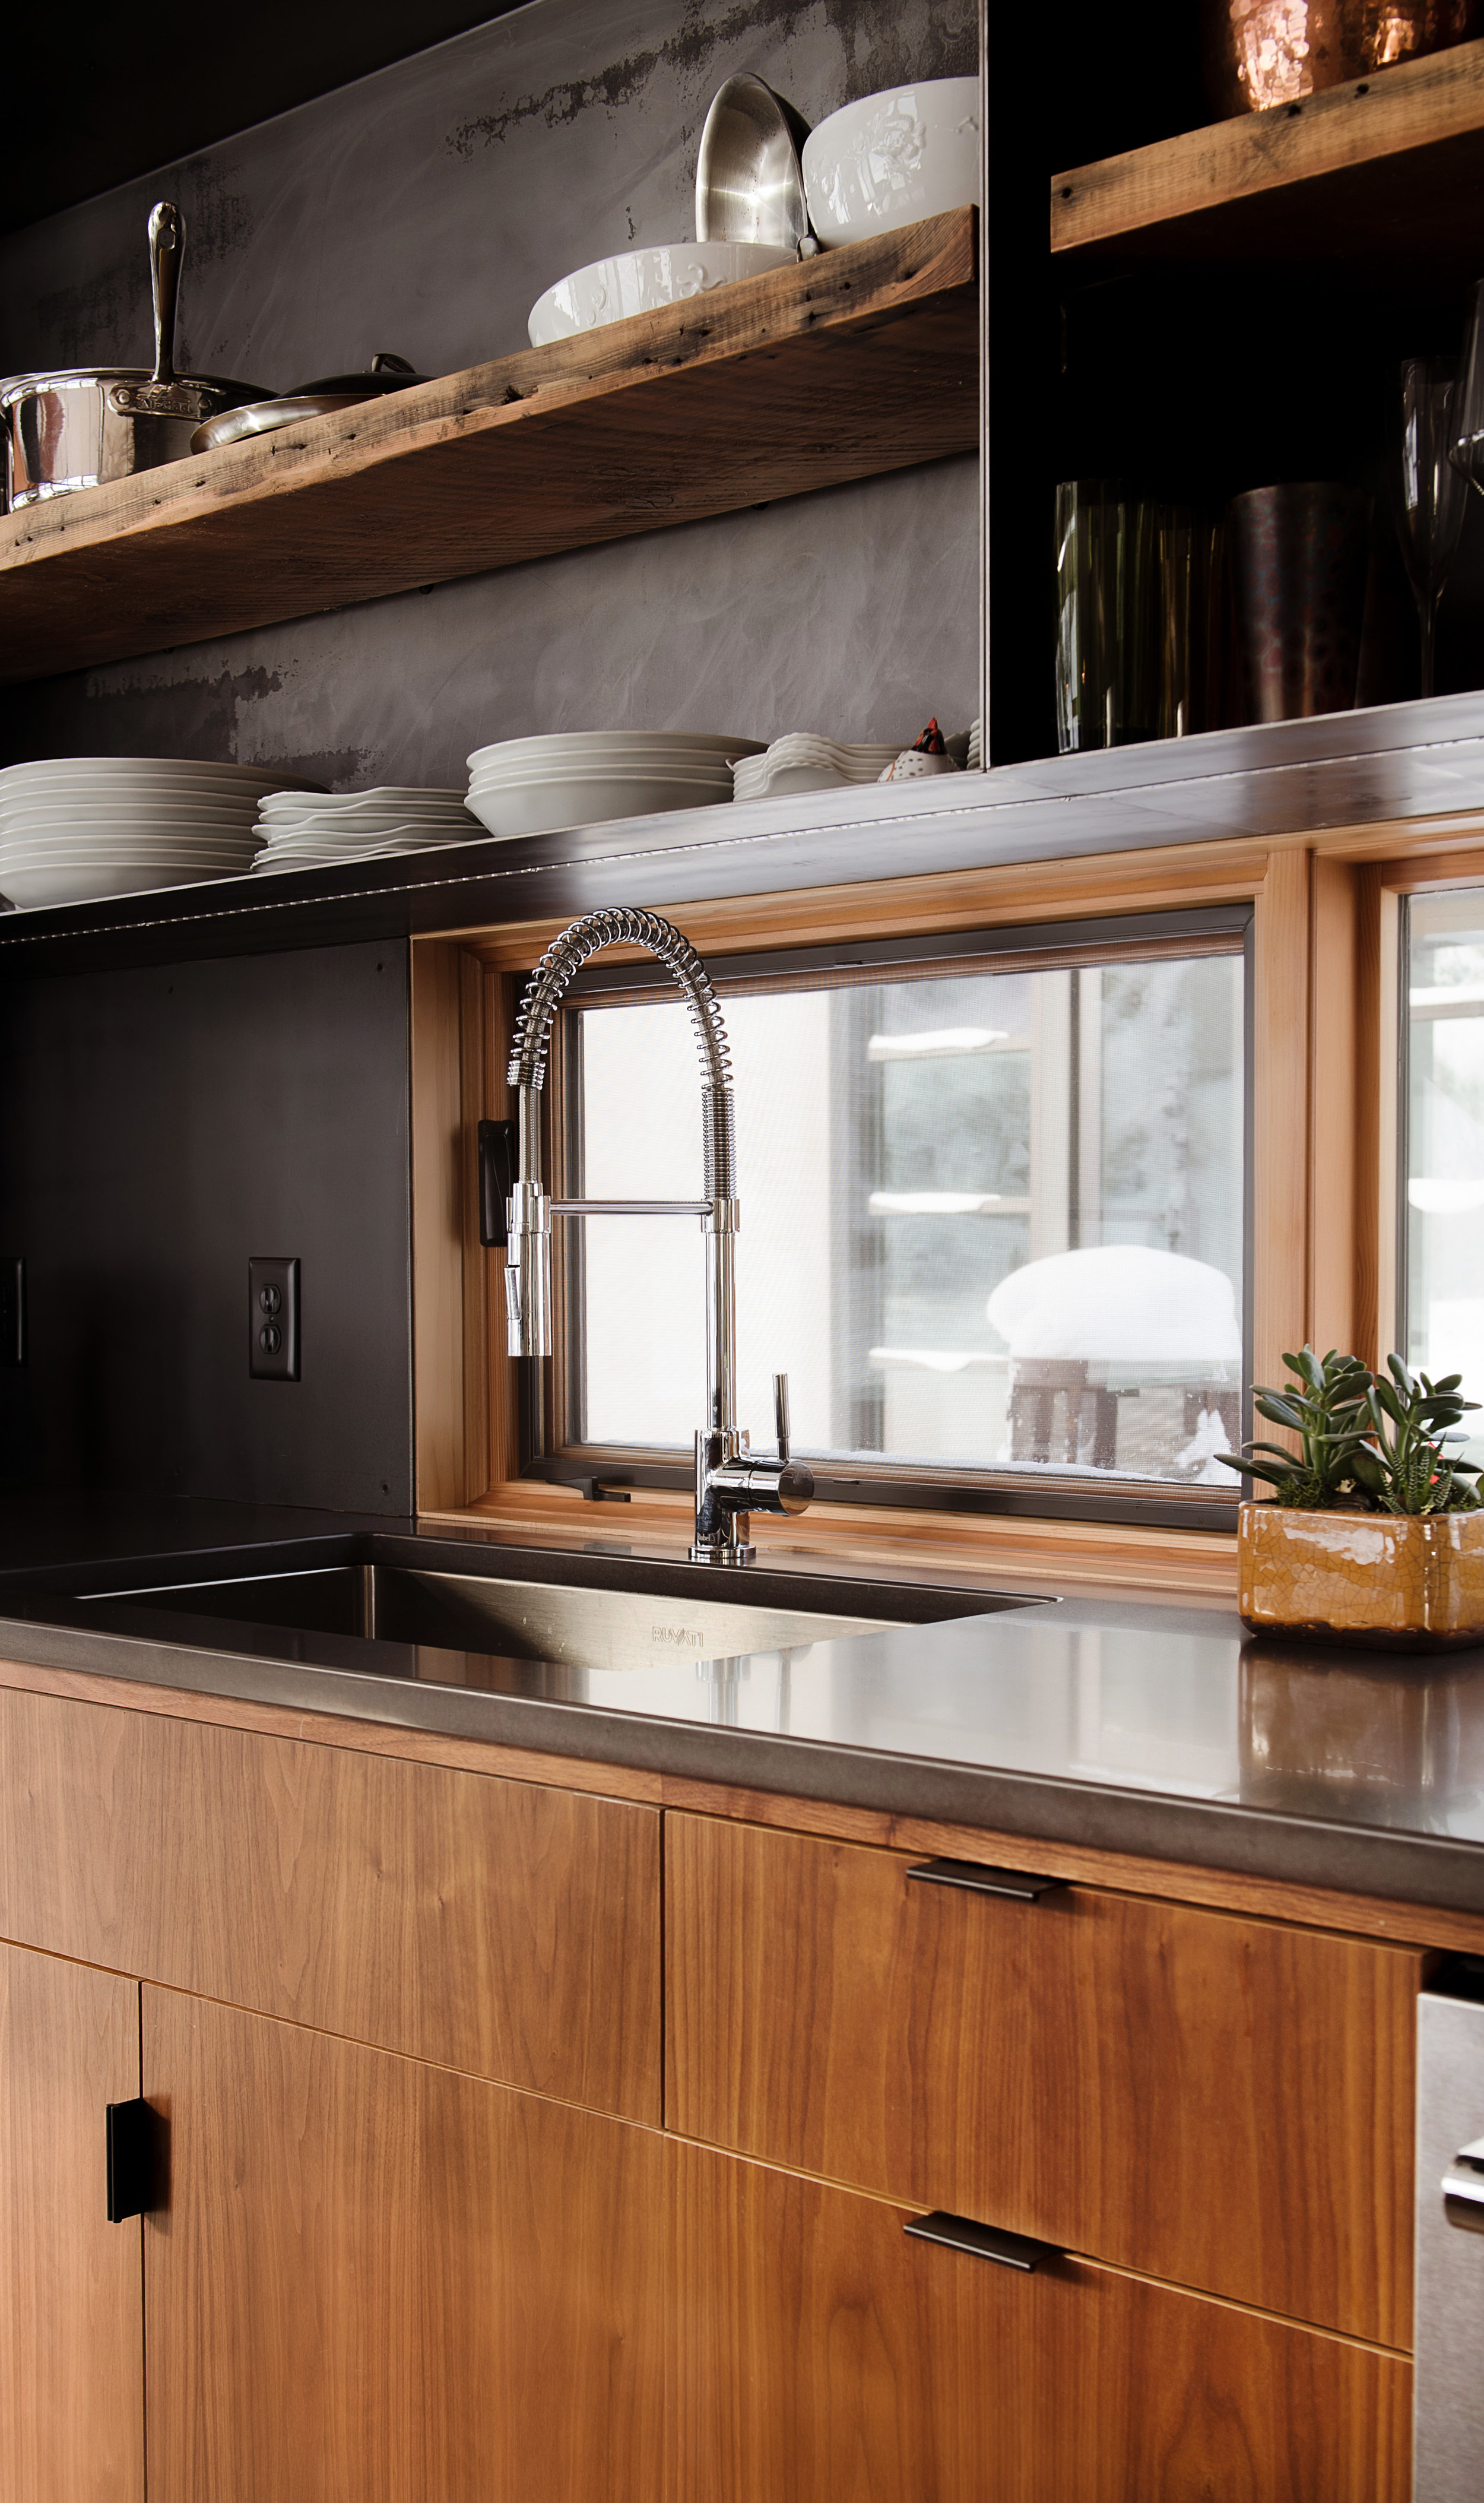 | Walnut Cabinetry | Steel Casework | Reclaimed Shelving |